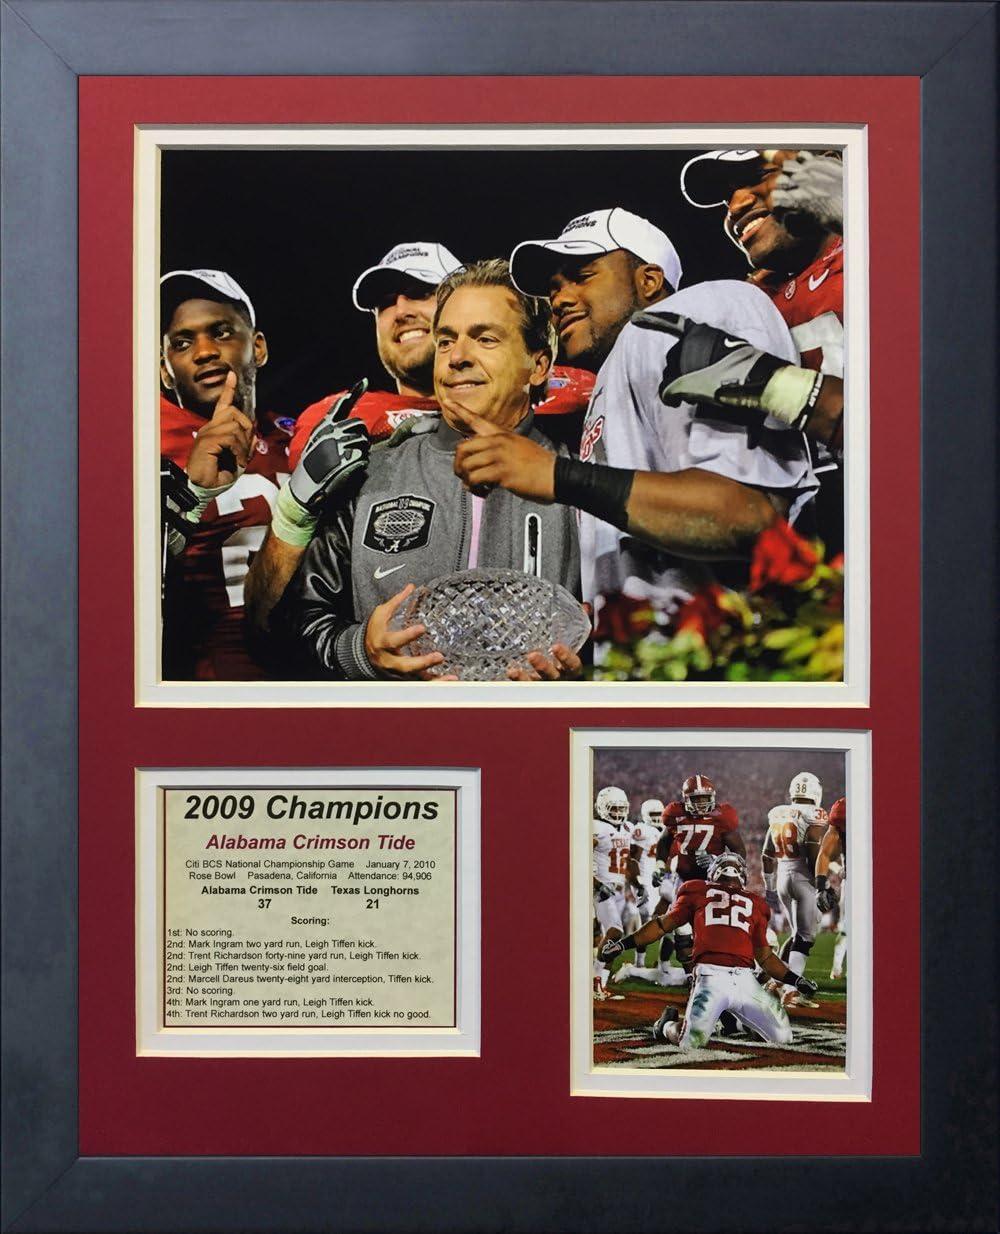 Legends Never Die 2012 Alabama Crimson Tide National Champions Framed Photo Collage 11 x 14-Inch